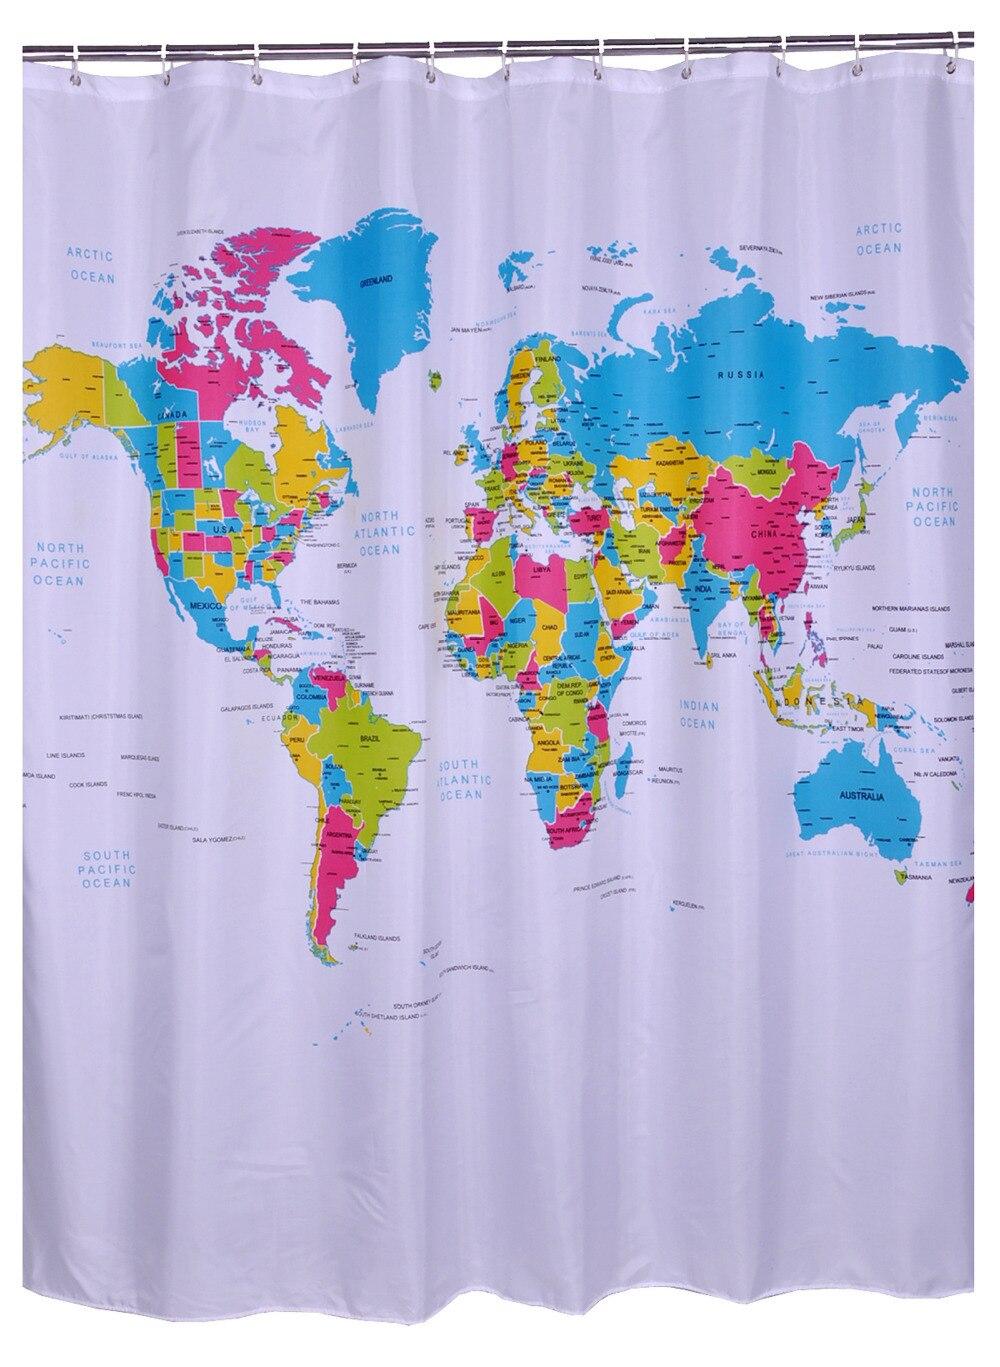 Bathroom Produts Printed World Map Shower Curtains Liner